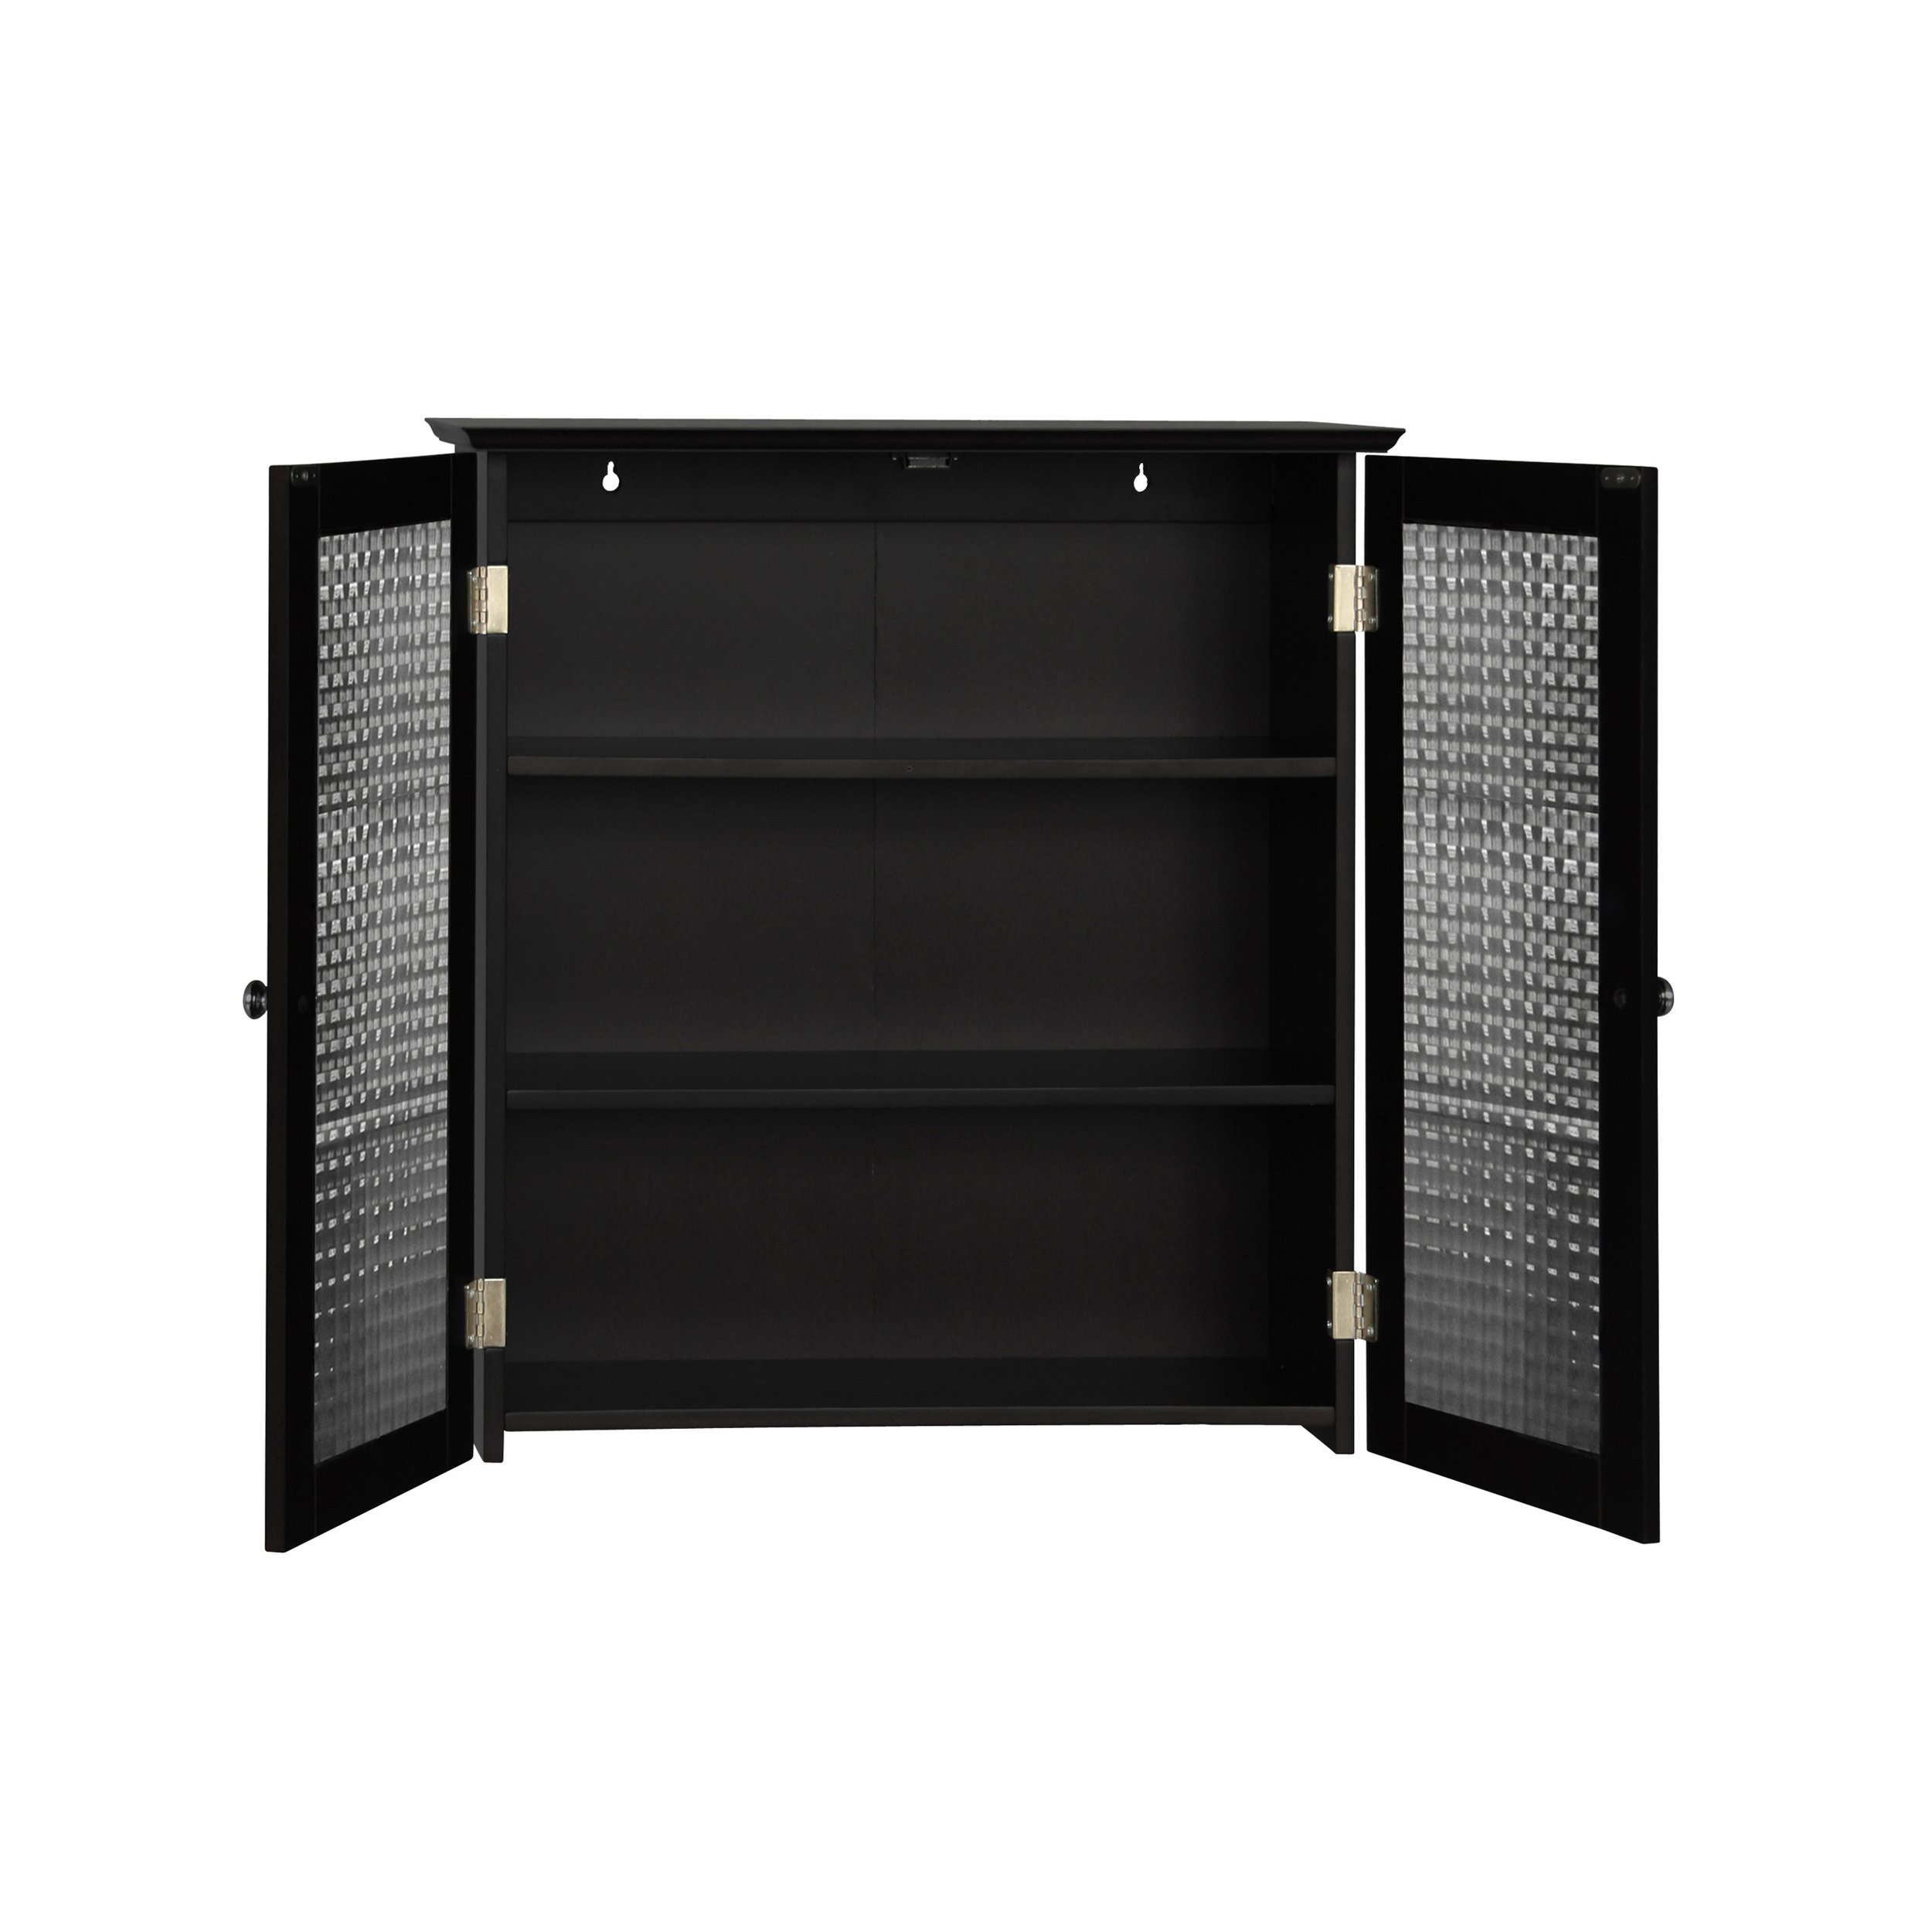 Elegant Home Fashions Chesterfield Wall Cabinet with Two Glass Doors by Elegant Home Fashions (Image #2)